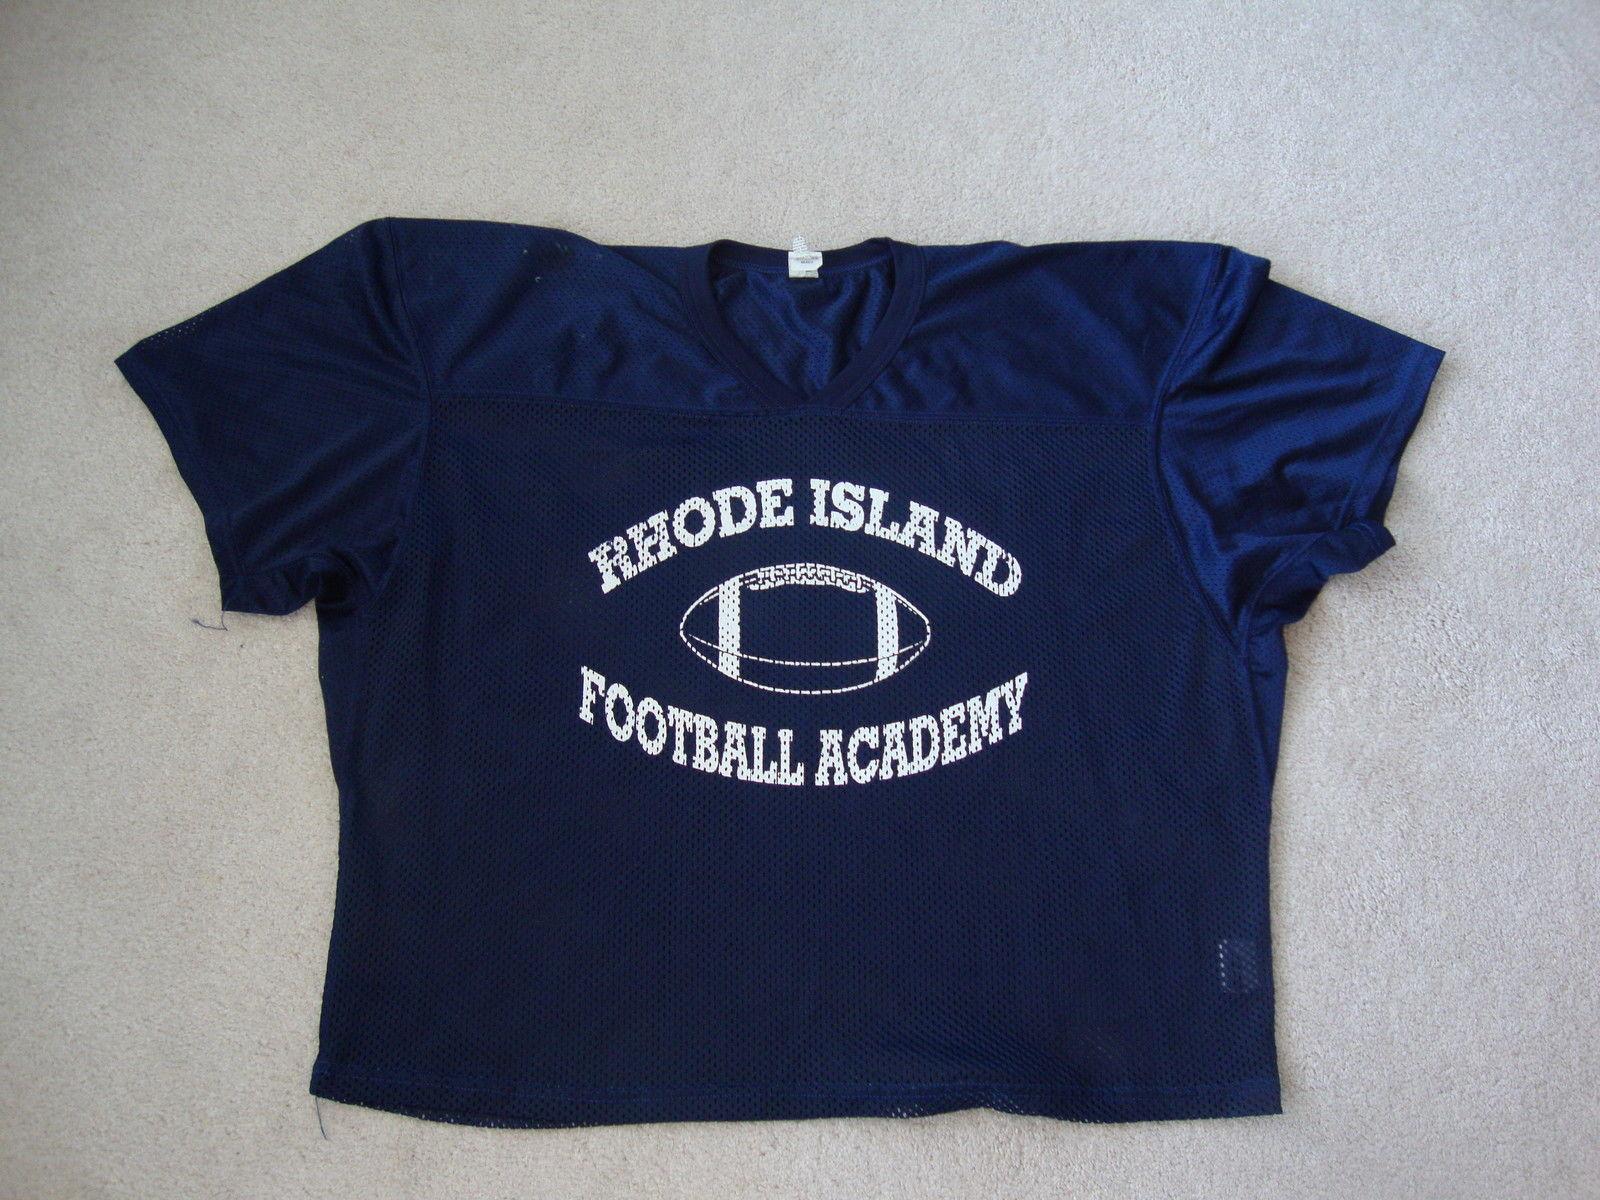 deshaun watson jersey academy